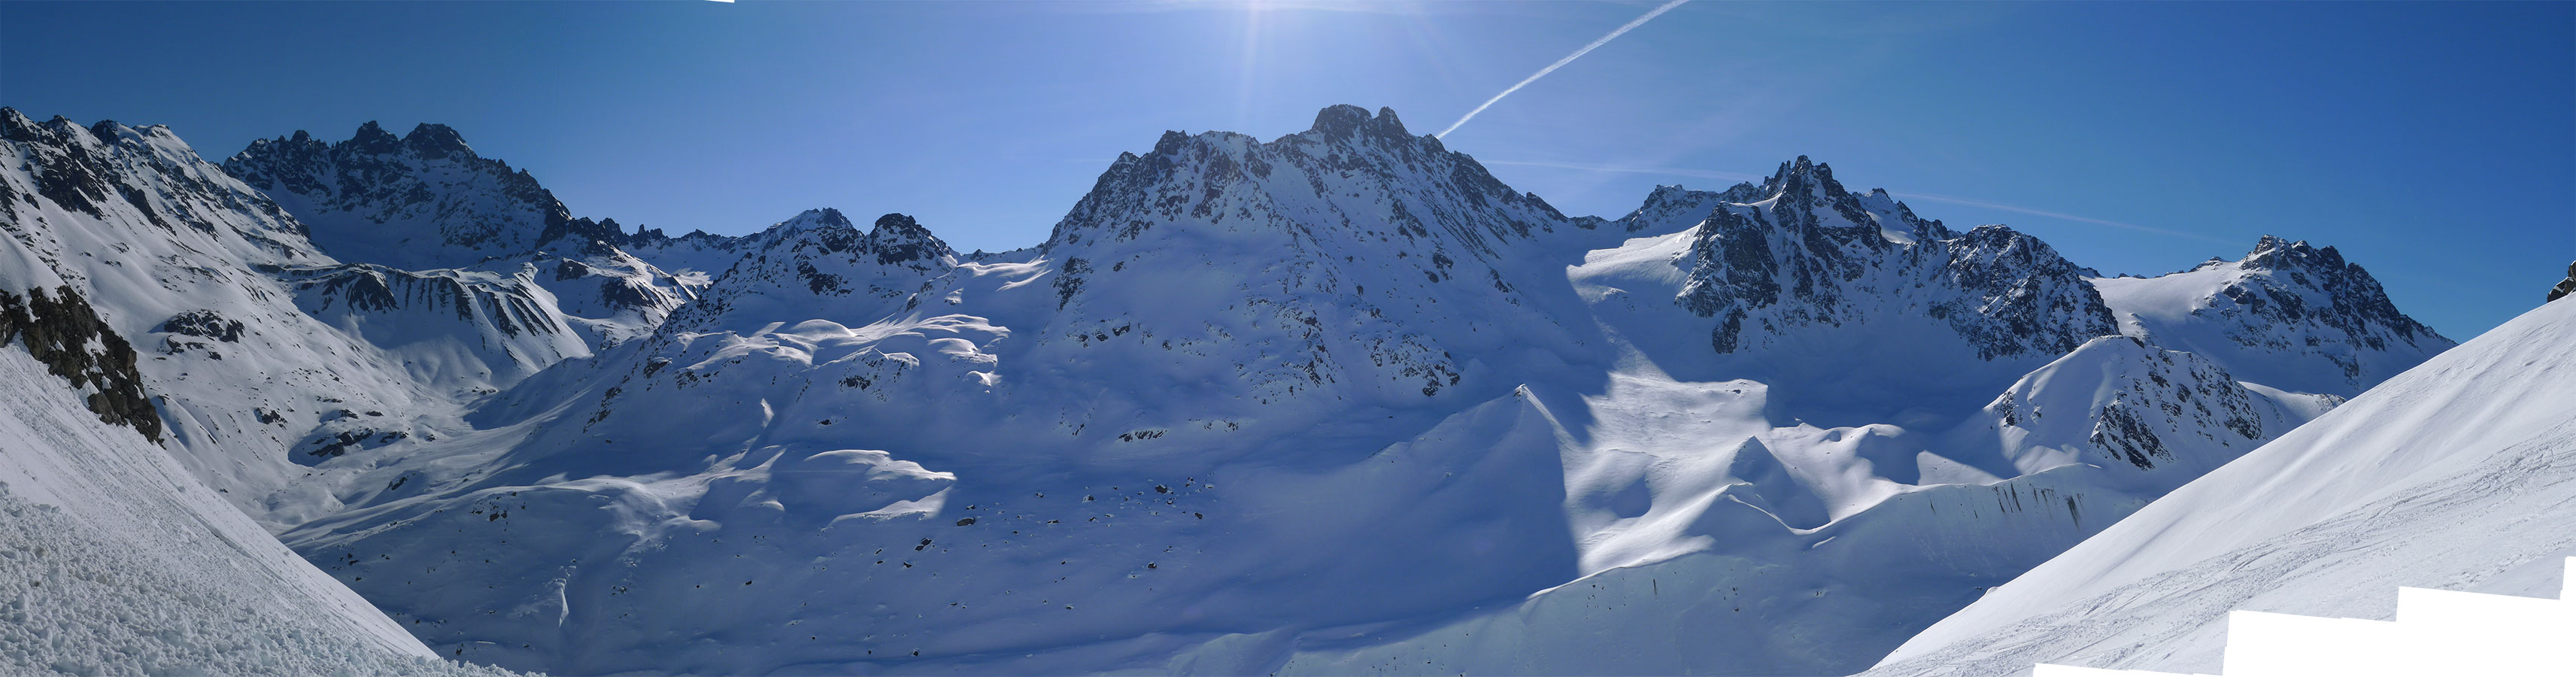 Haagspitze East (Jamtalhütte) Silvretta Austria panorama 09